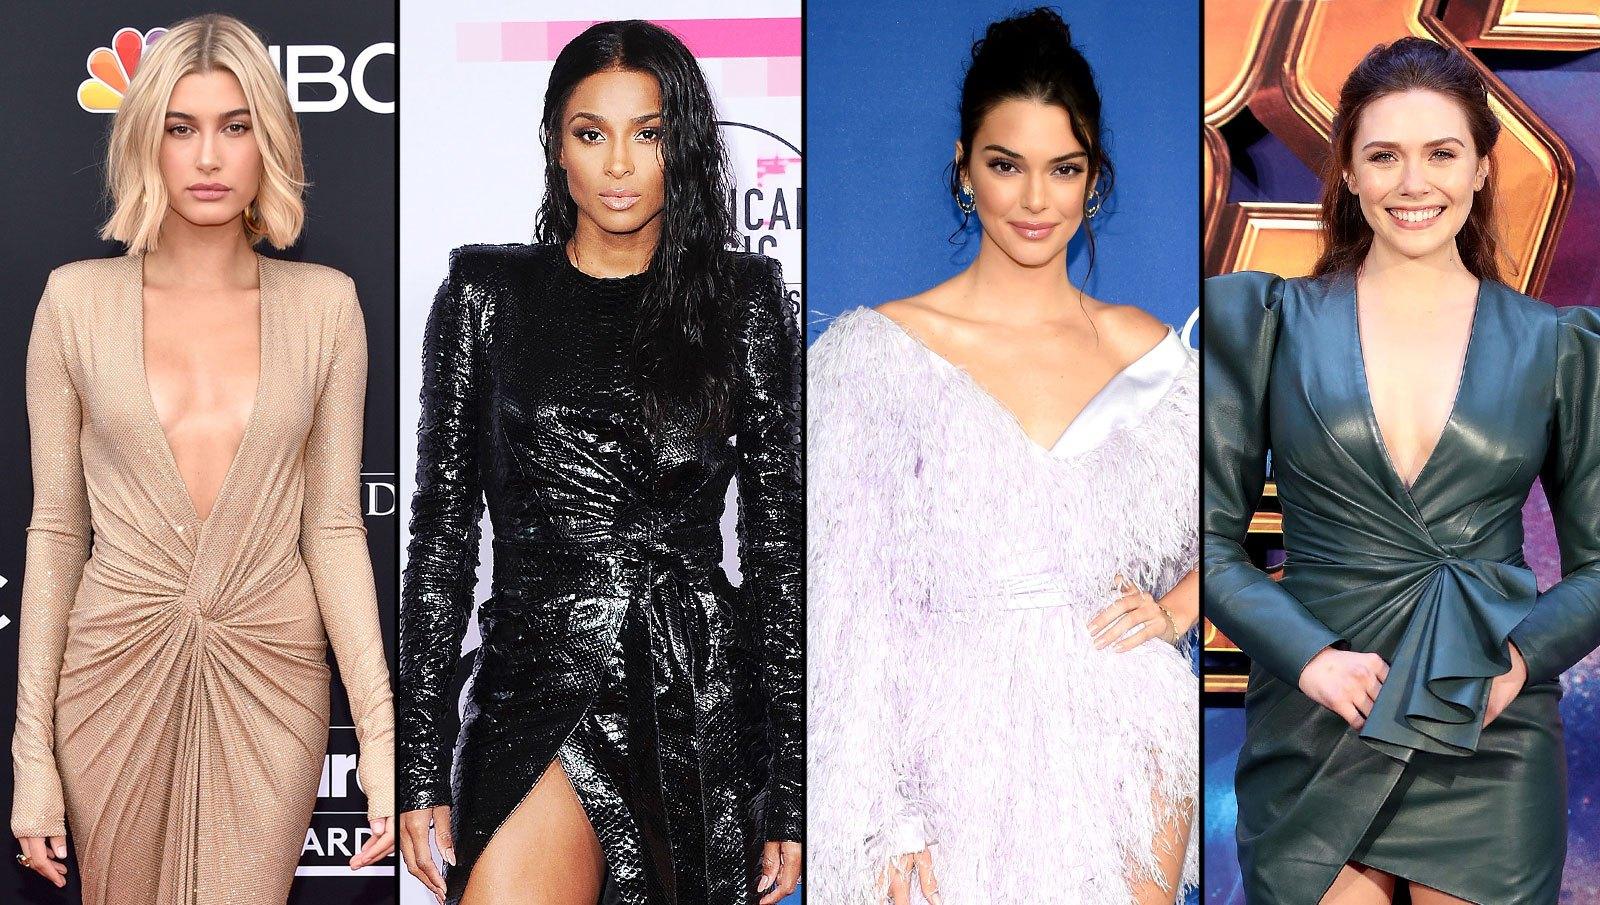 Hailey Baldwin, Ciara, Kendall Jenner and Elizabeth Olsen